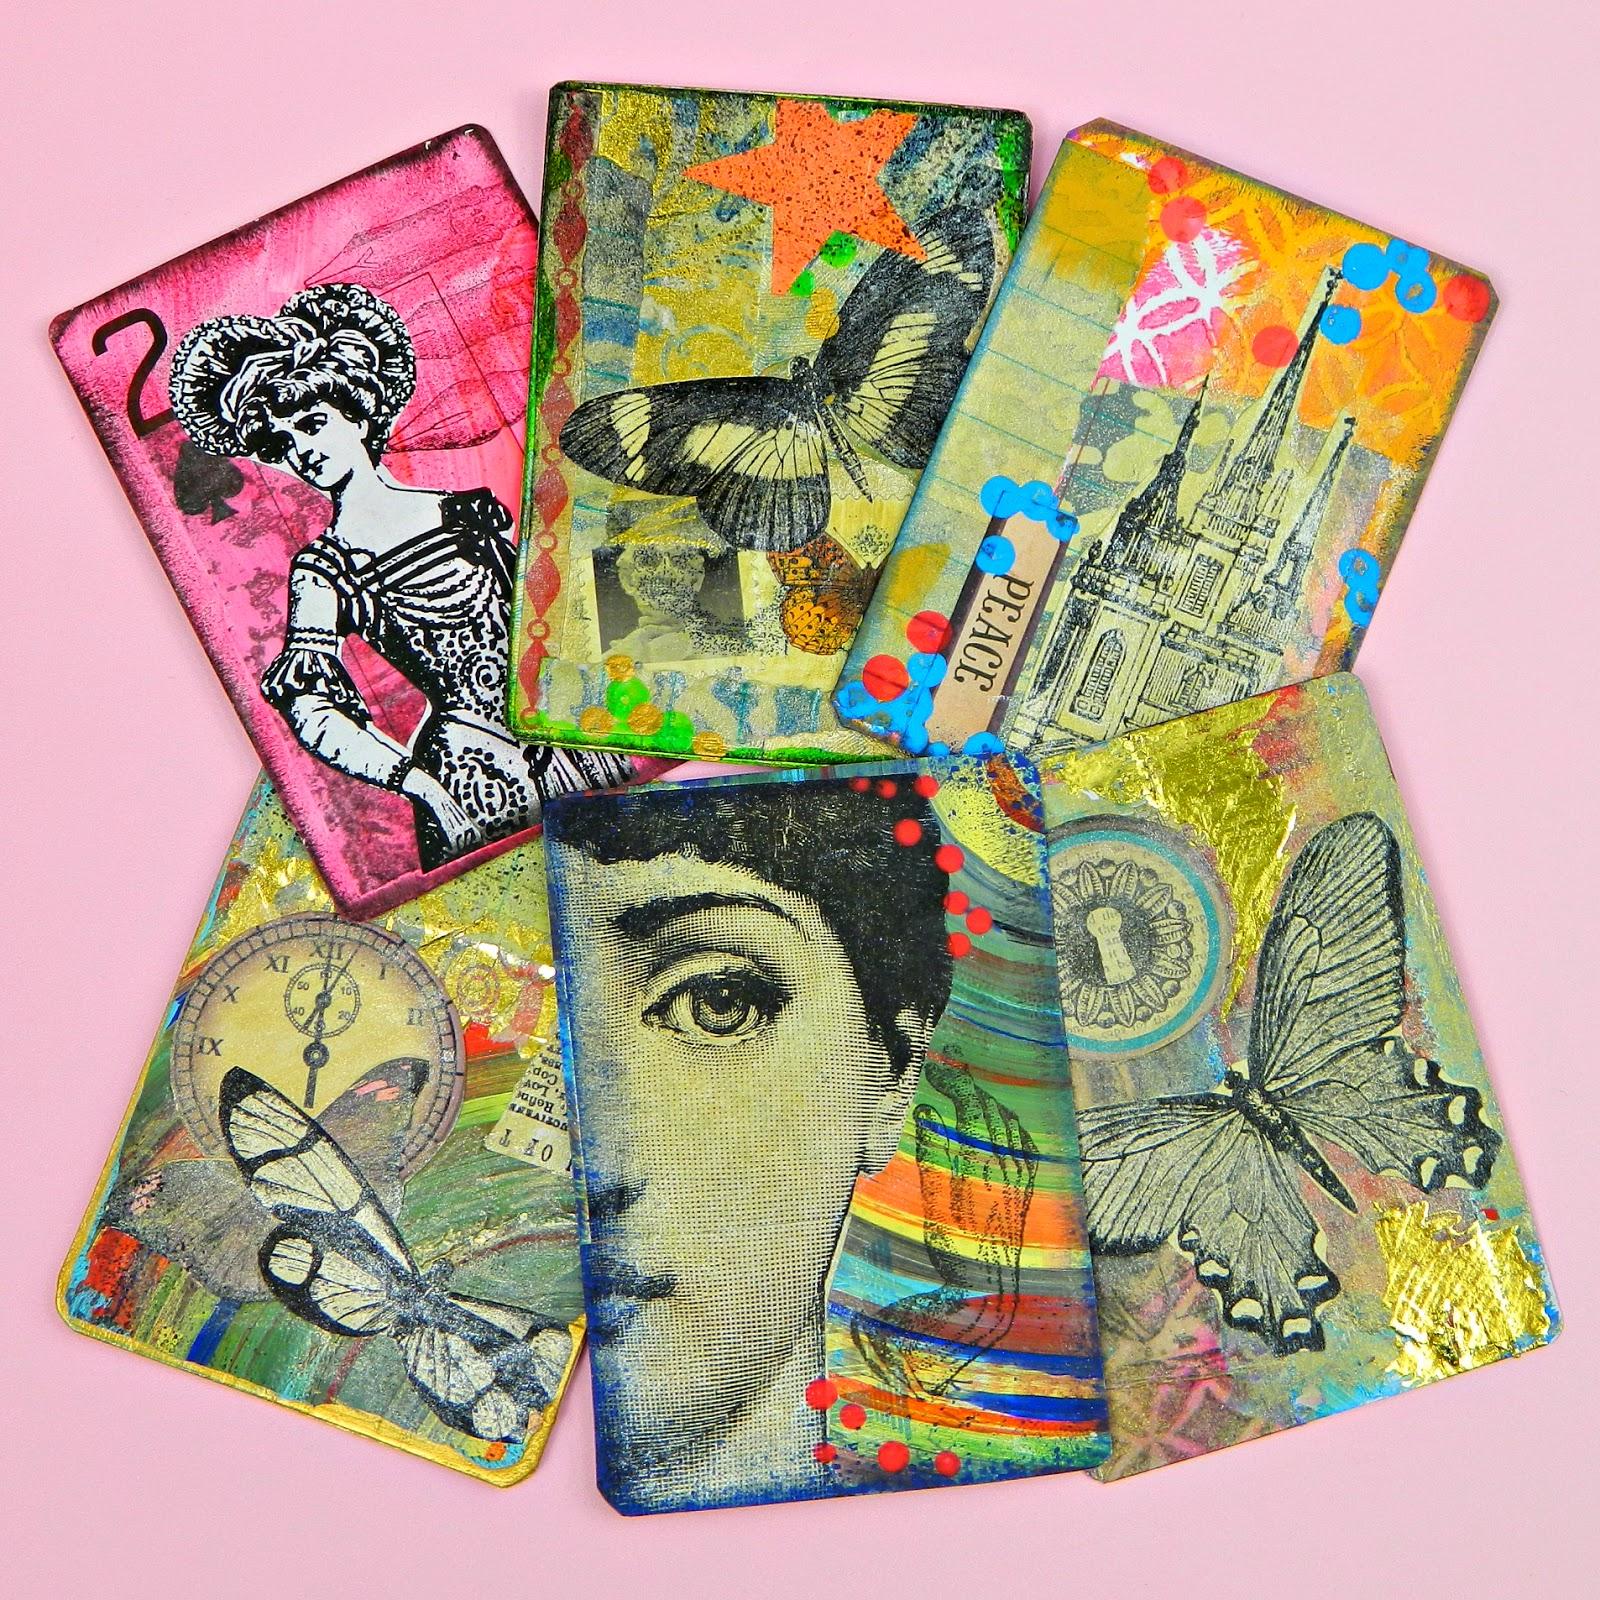 mark montano artist trading cards diy and swap. Black Bedroom Furniture Sets. Home Design Ideas